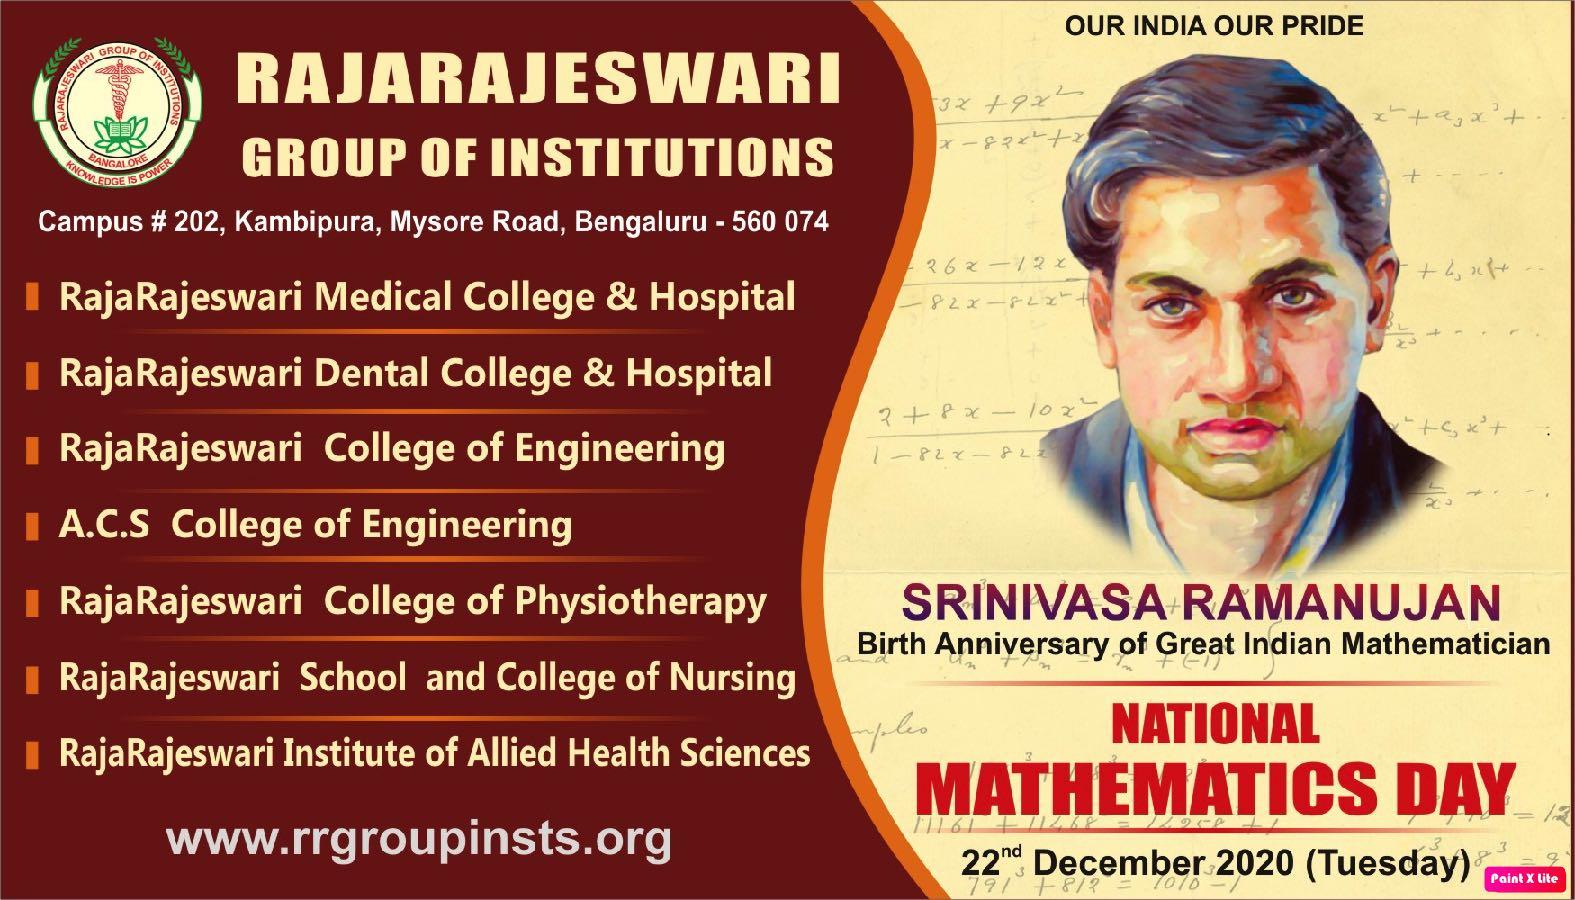 National Mathematics Day